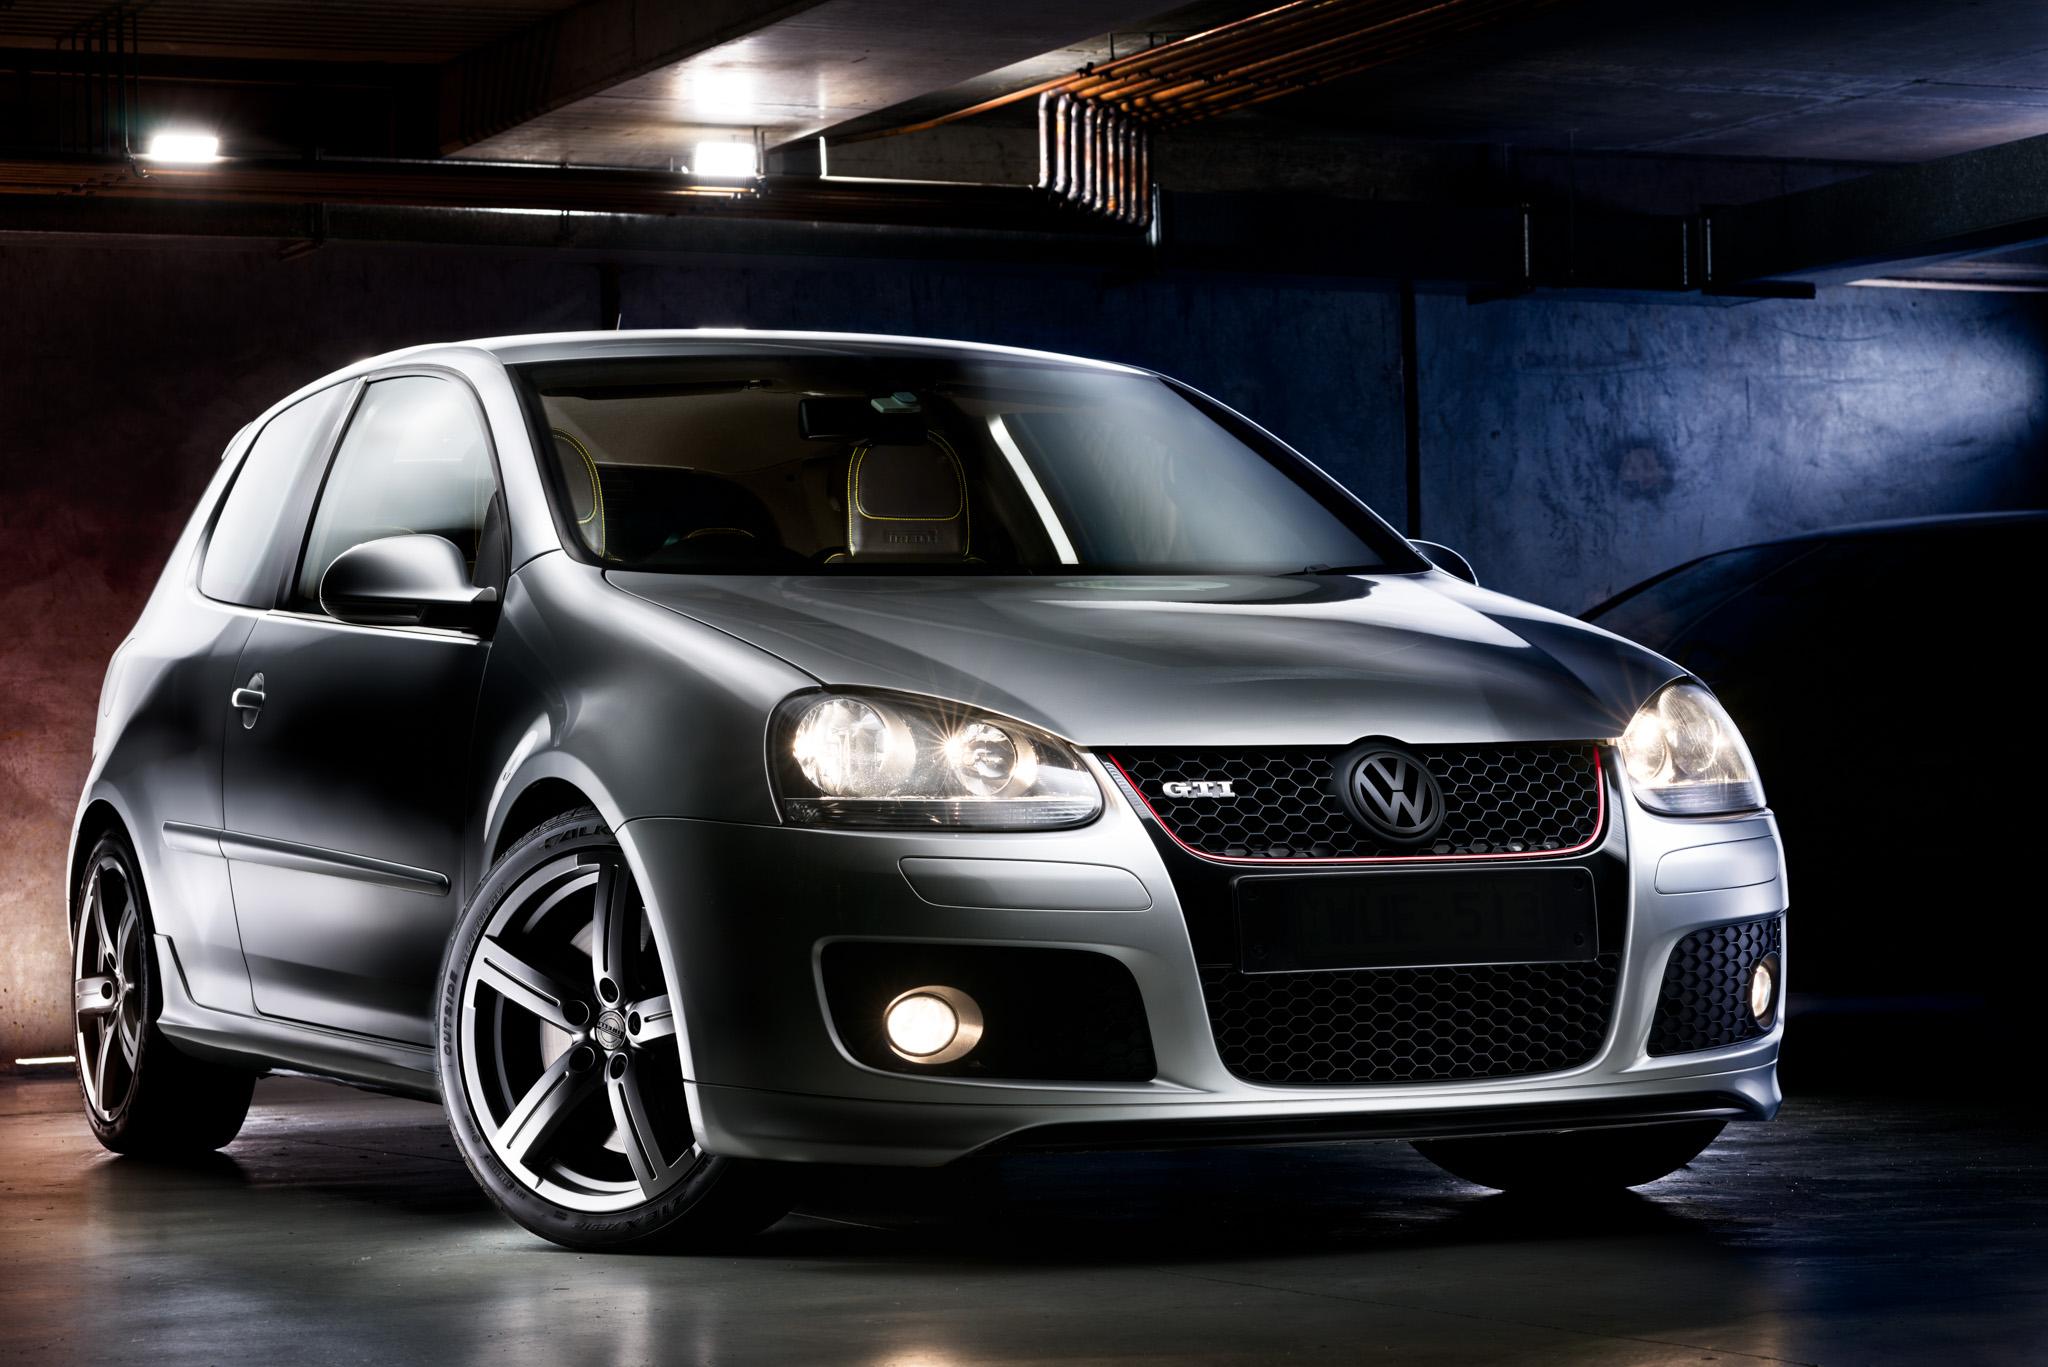 Light Painting - Volkswagen Golf GTI Mk5 silver Pirelli Edition